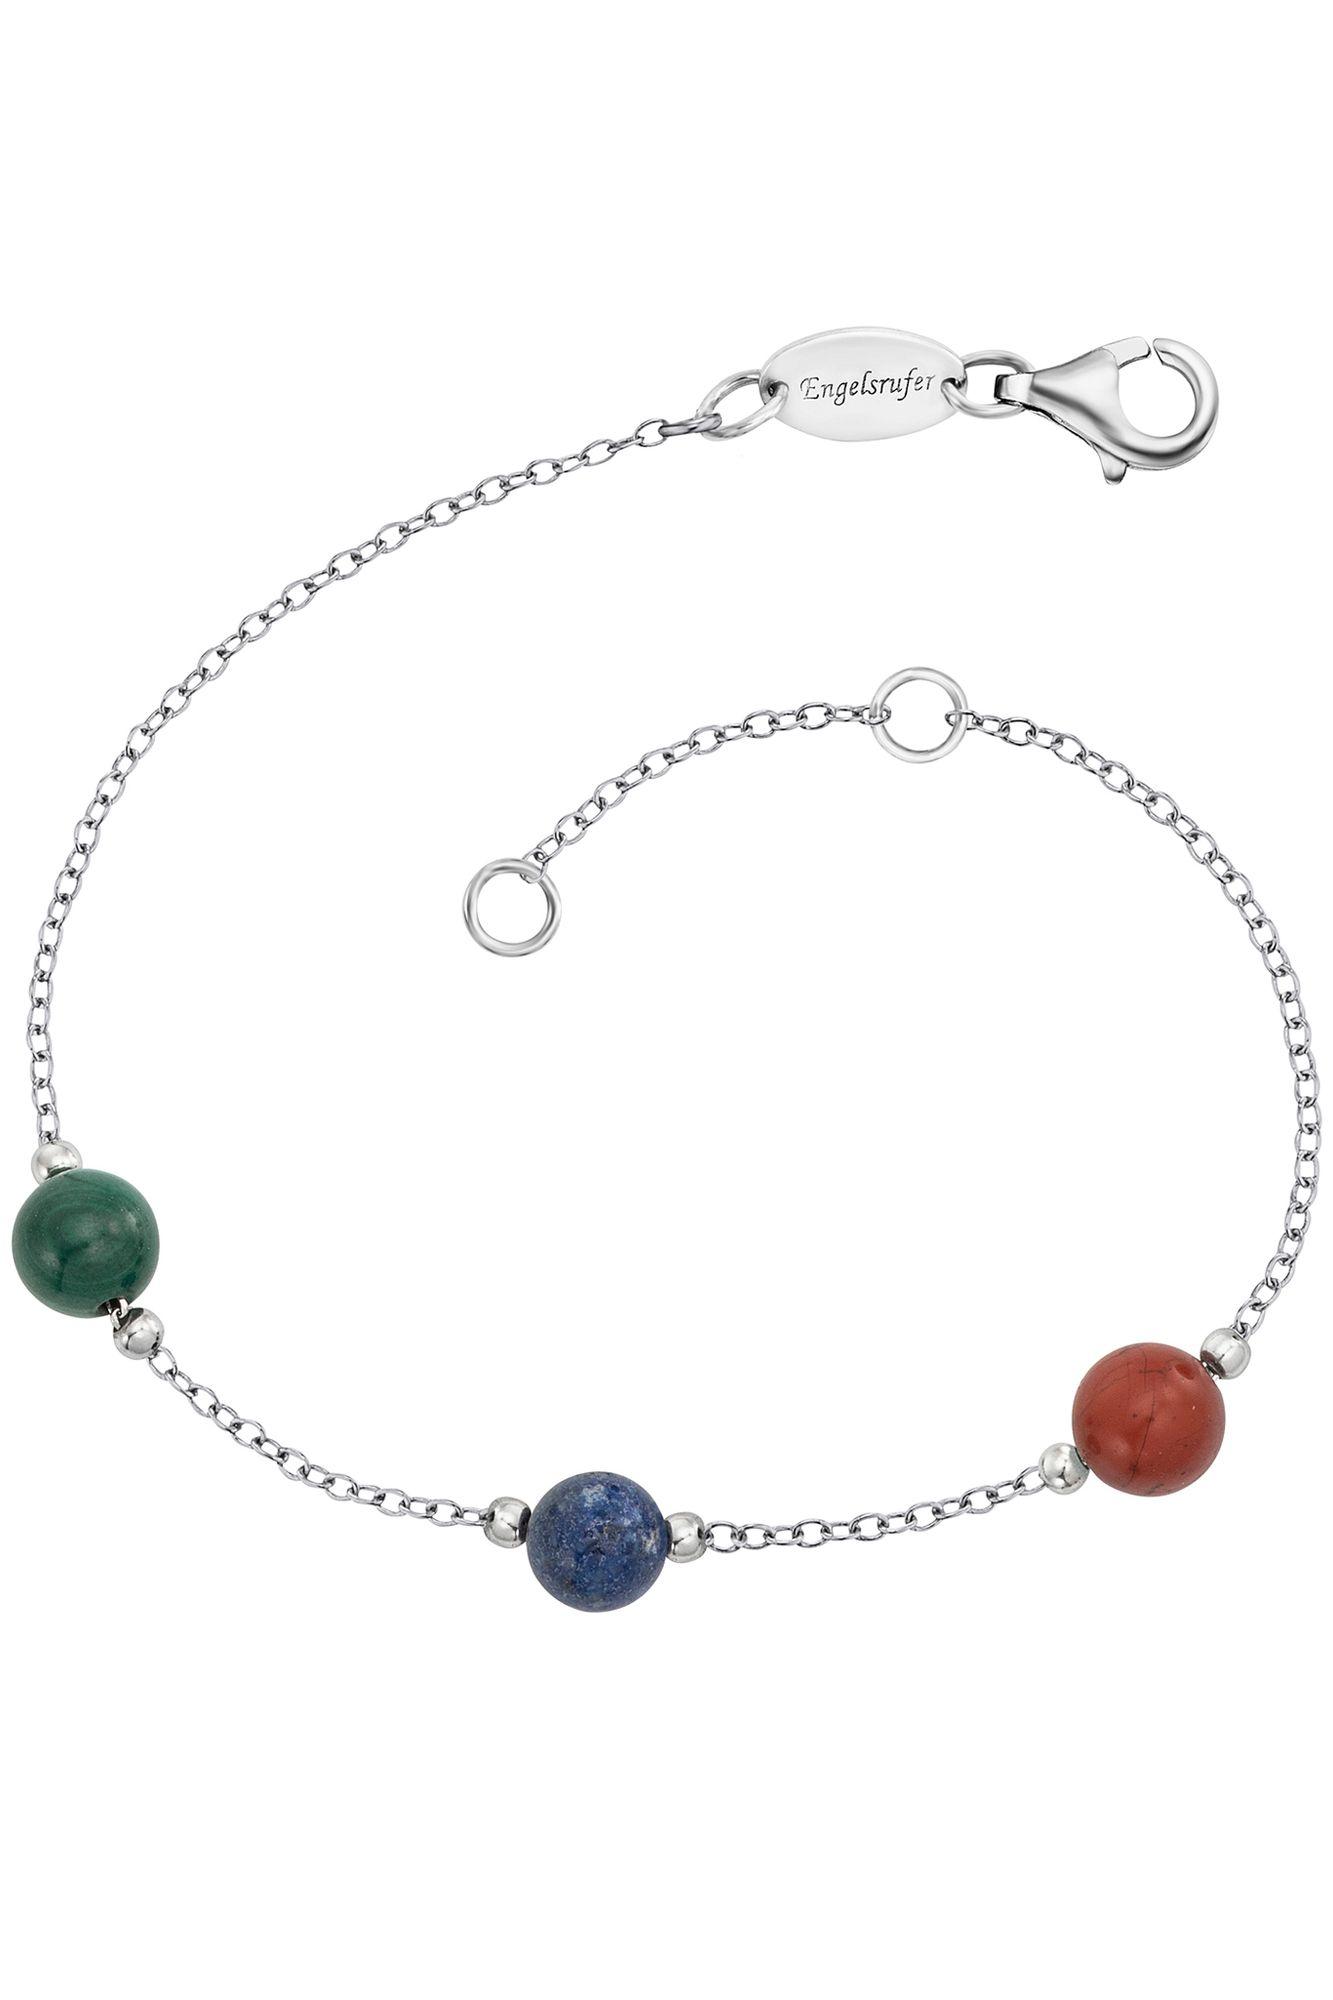 Engelsrufer ERB-LILGEM-3ST-02 Damen Armband Powerful Stone 19 cm